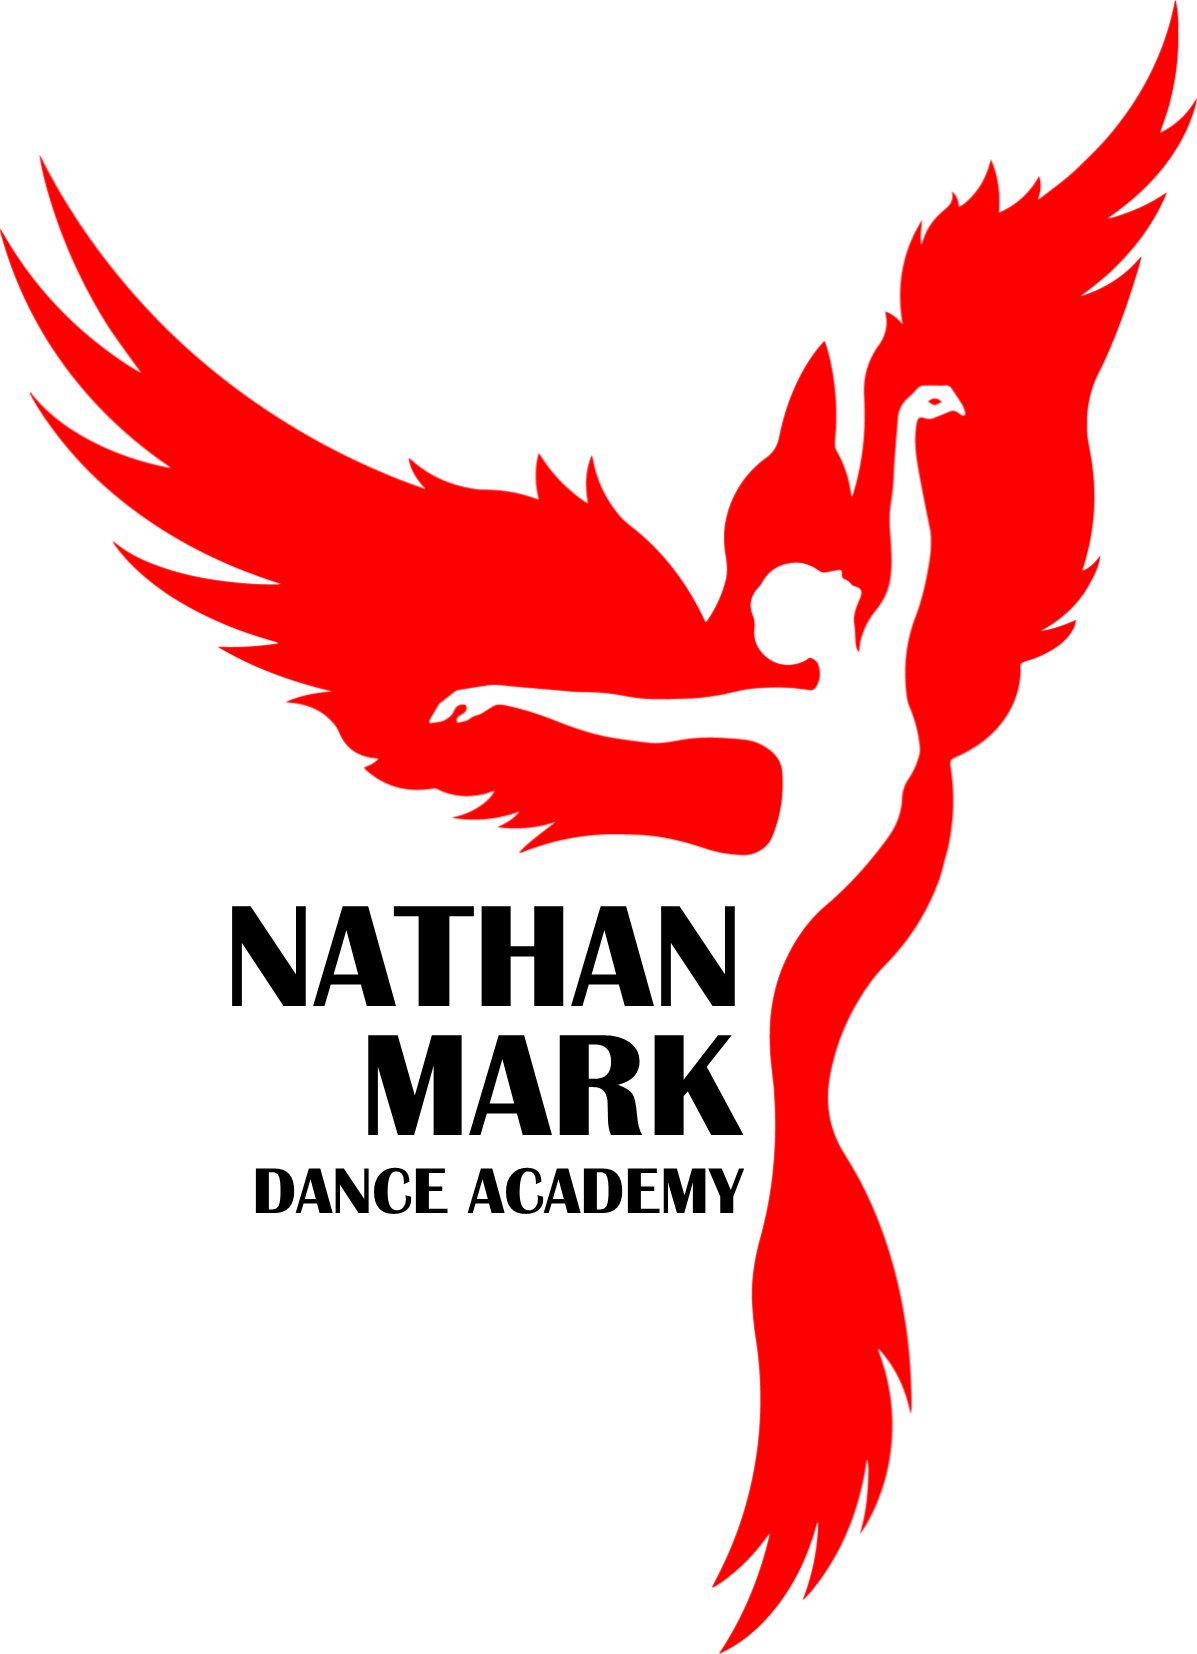 Nathan Mark Dance Academy